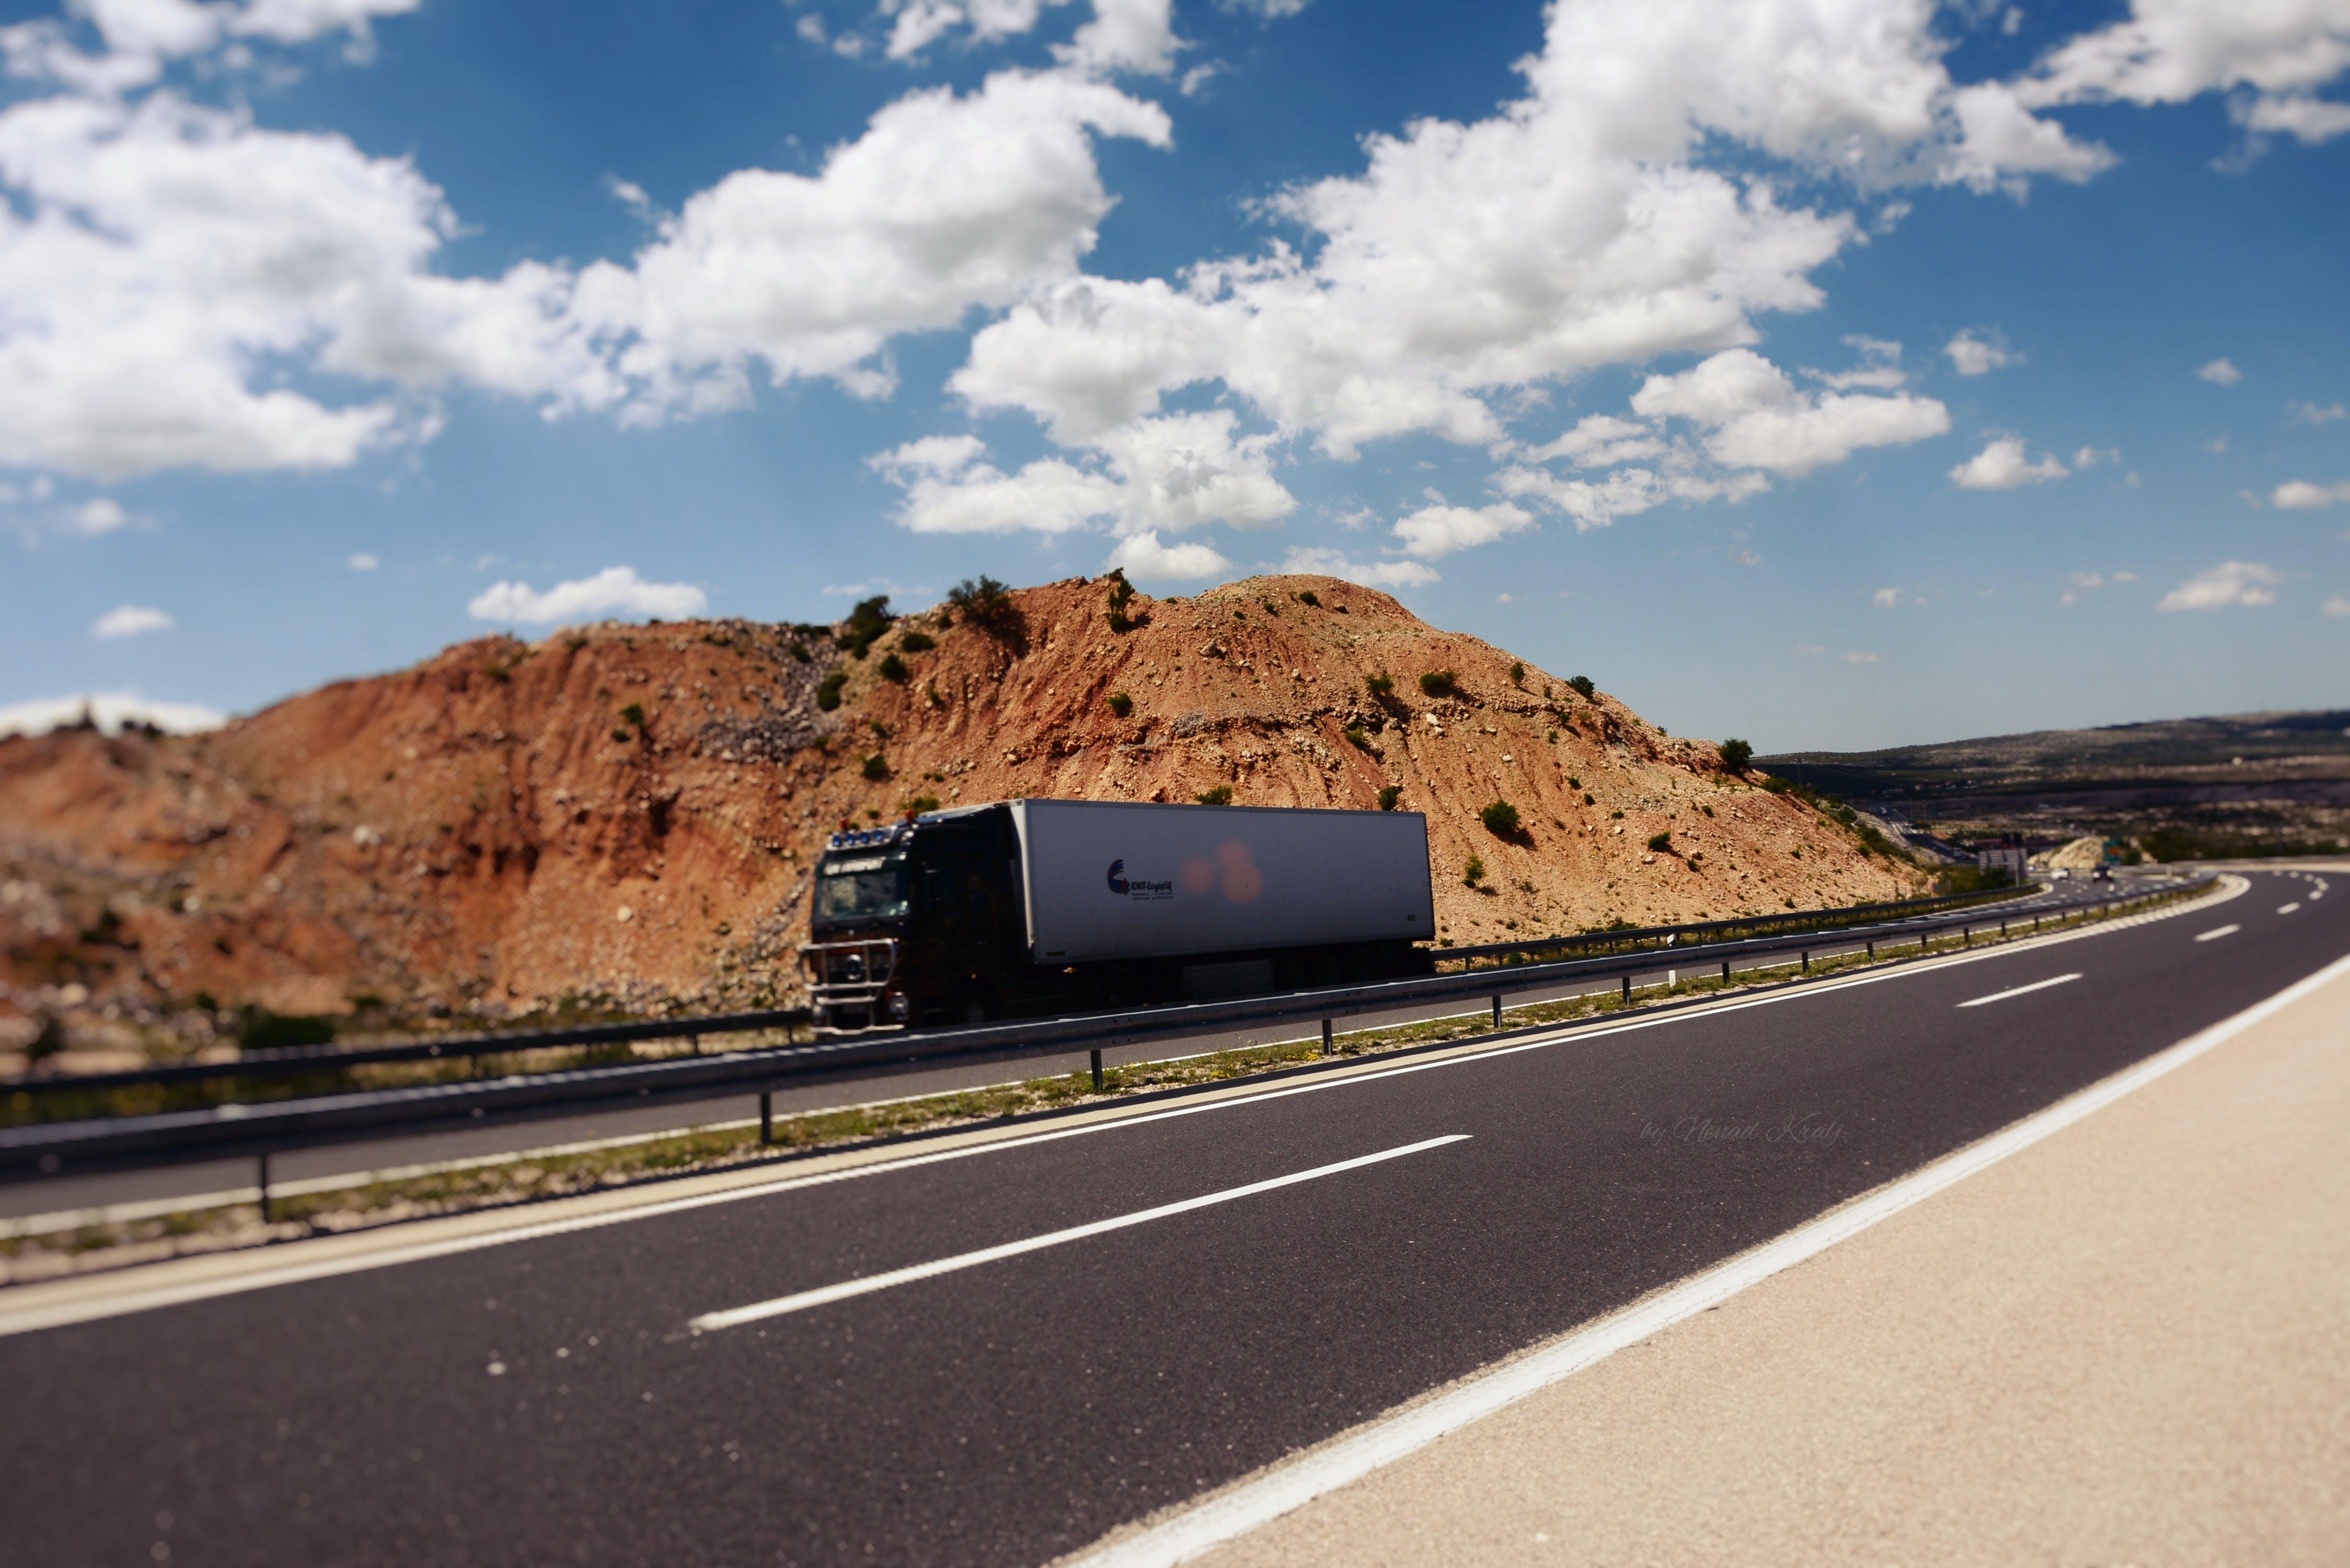 Free stock photo of road, desert, highway, semi-trailer truck